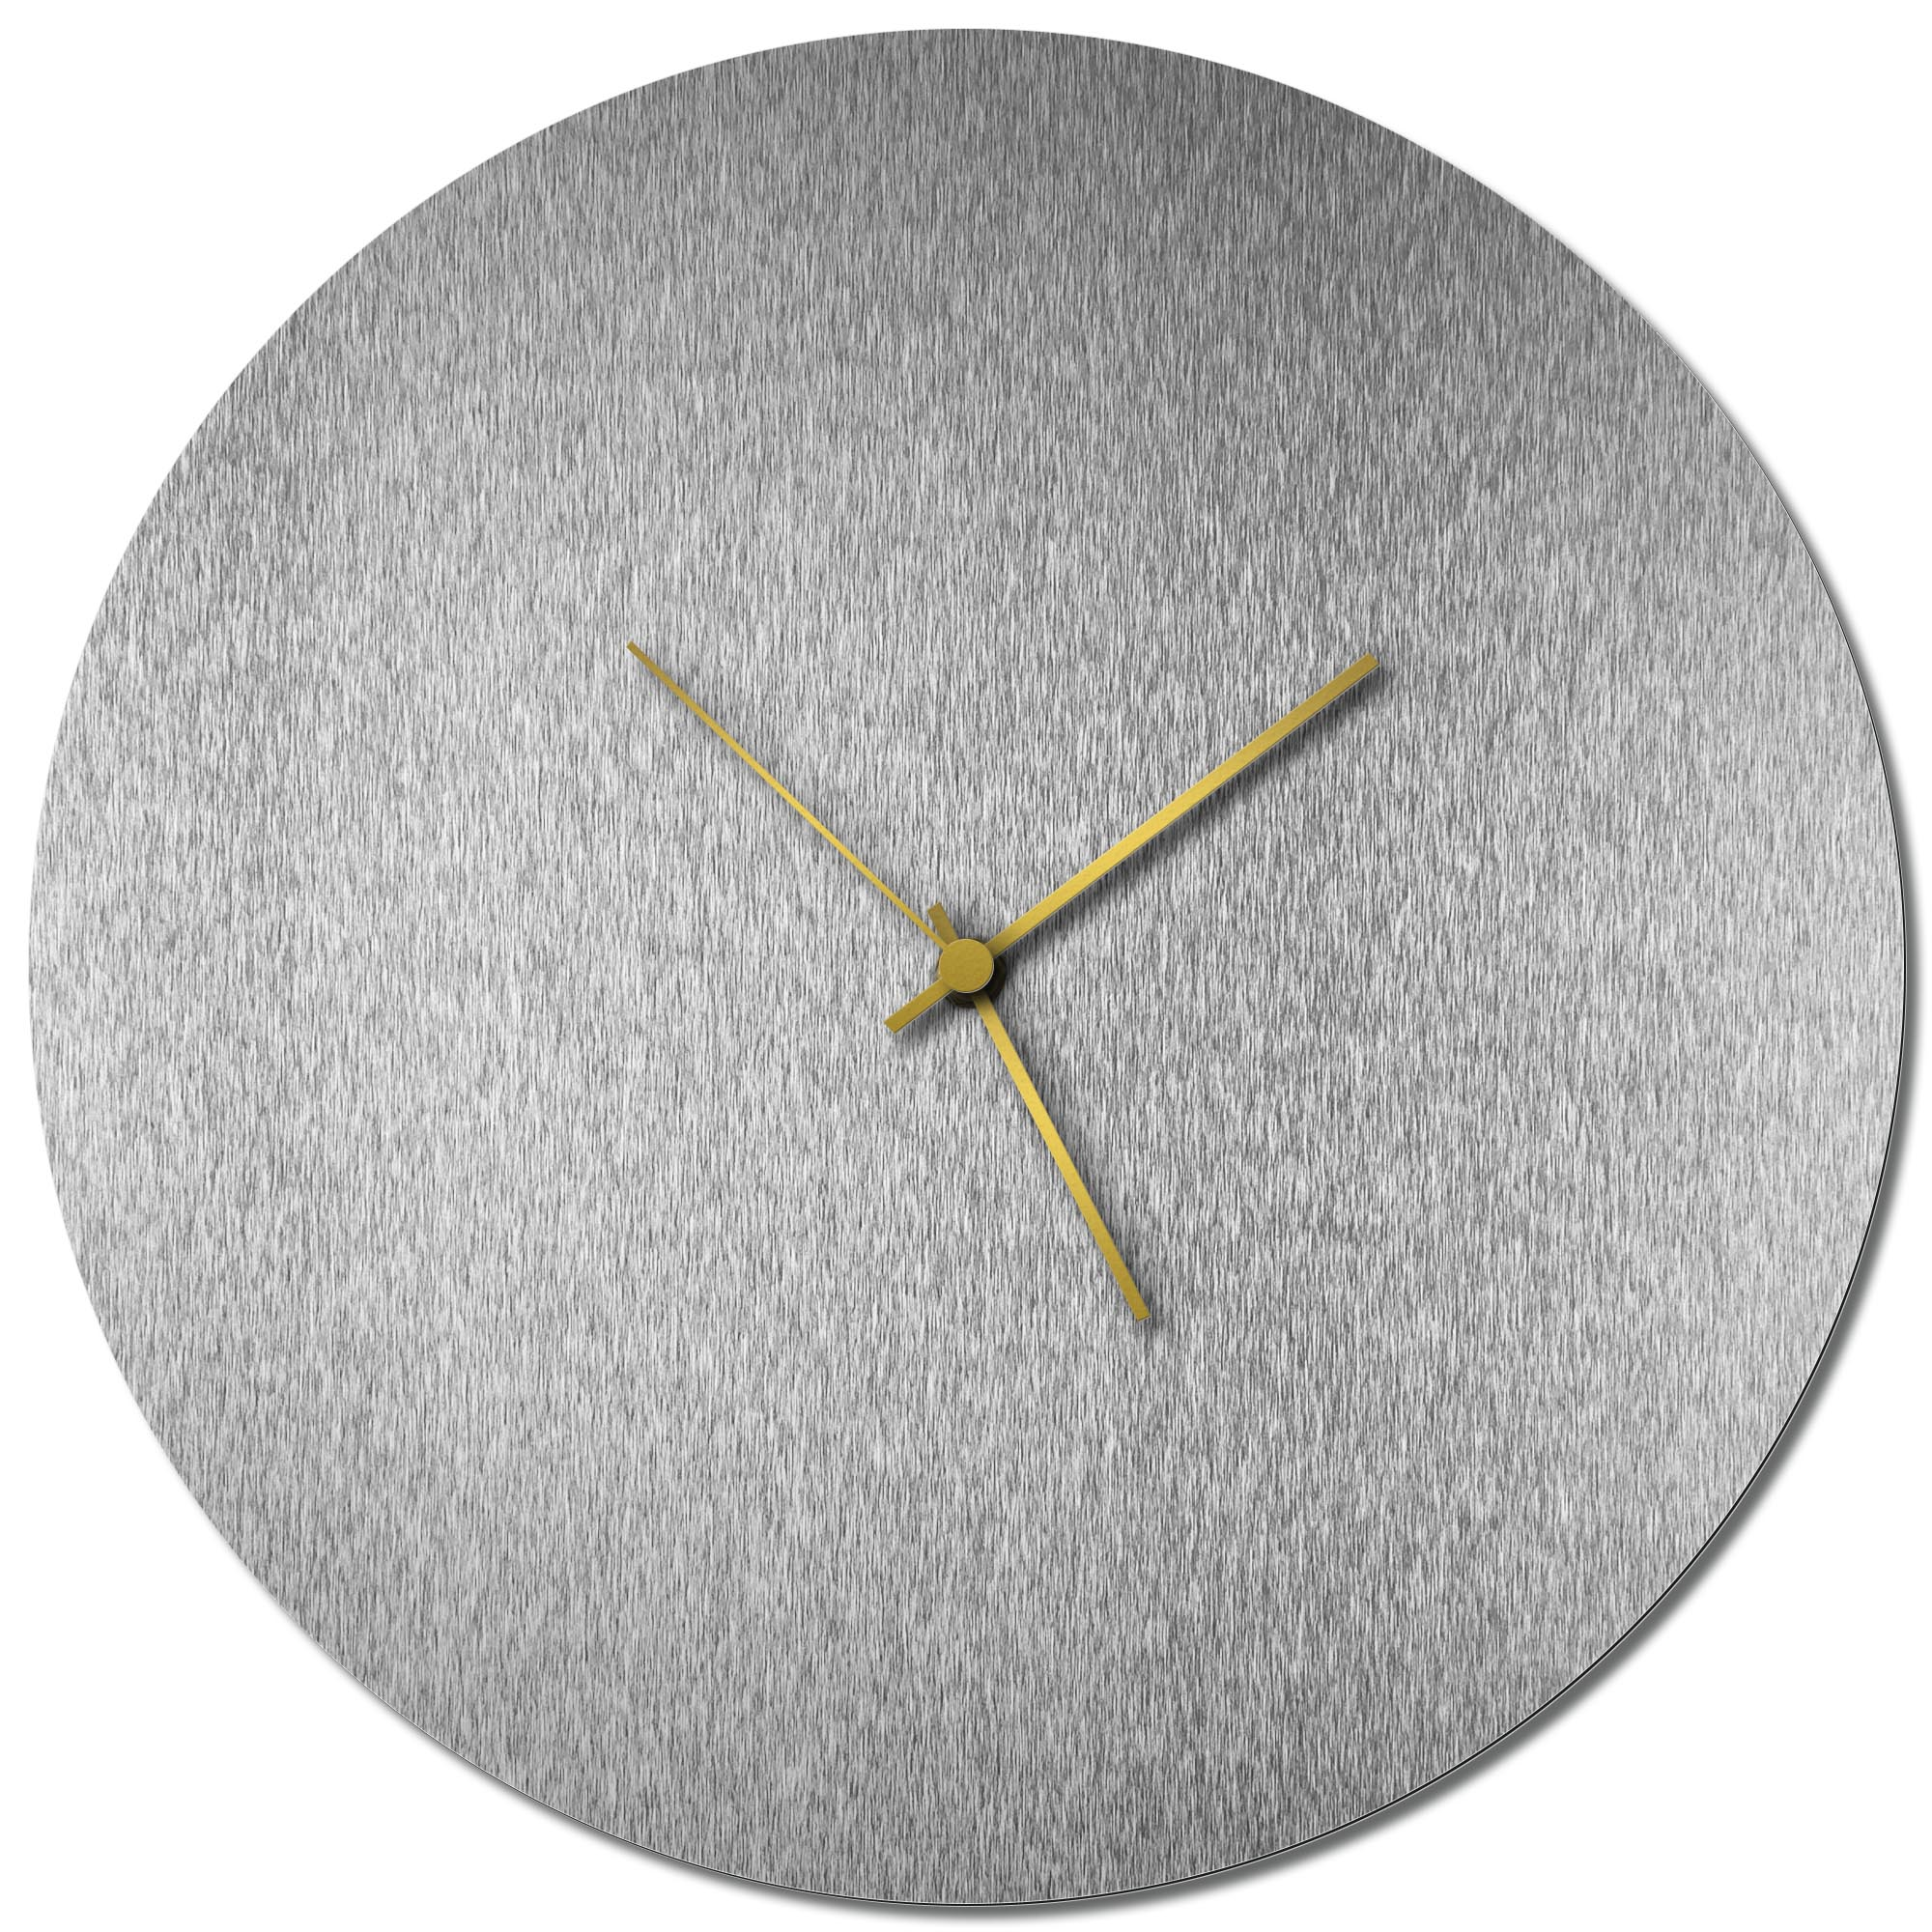 Adam Schwoeppe 'Silversmith Circle Clock Large Gold' Midcentury Modern Style Wall Clock